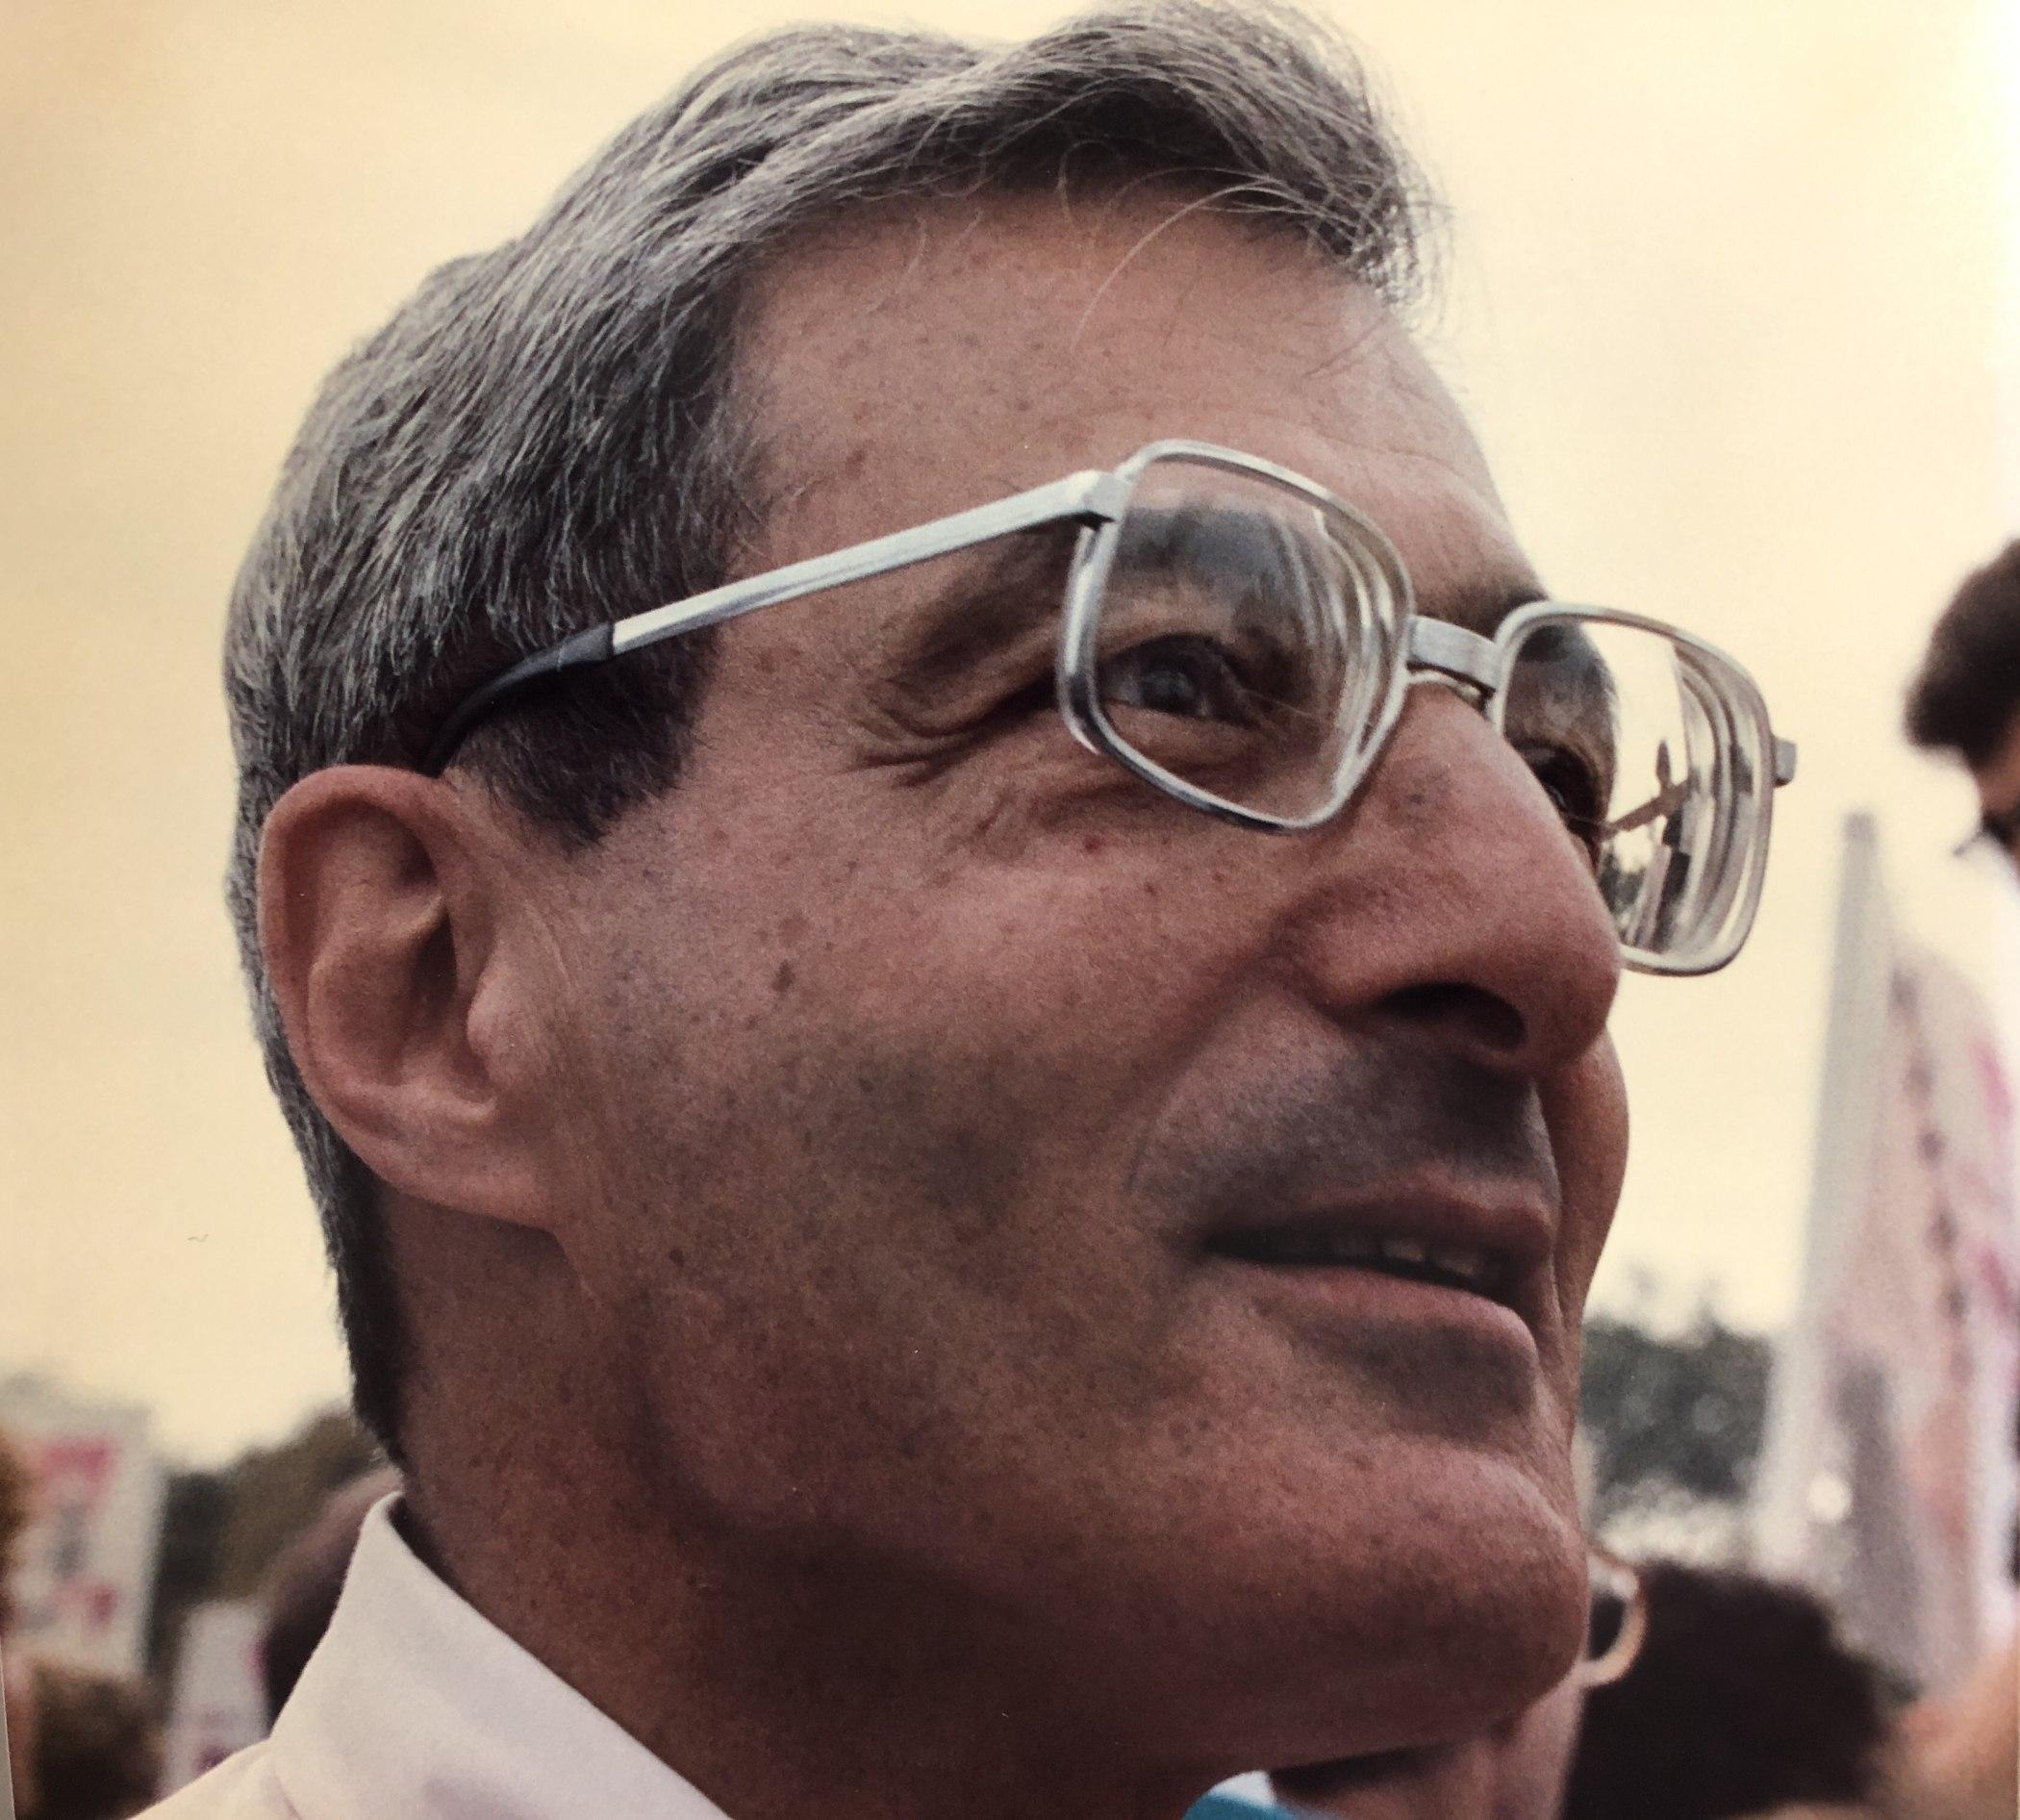 Dr. David R. Kessler circa 1979-80.